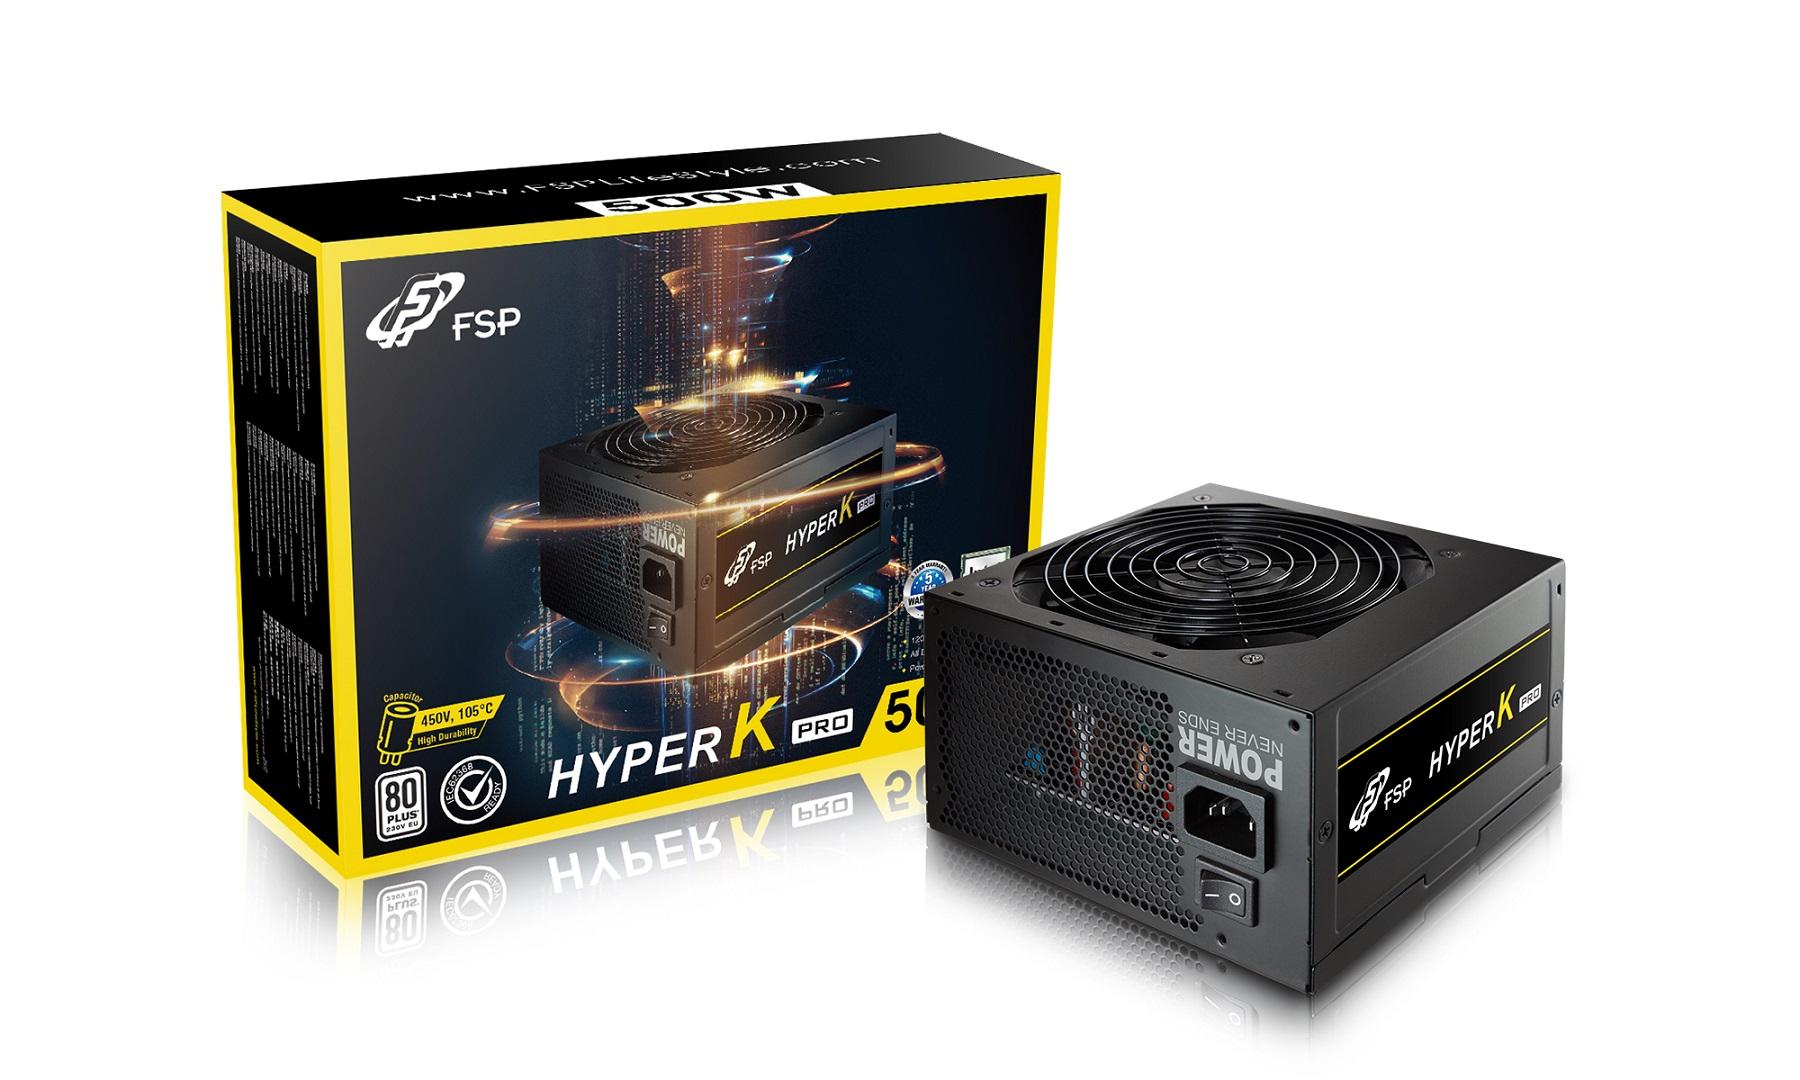 FSP/Fortron HYPER K PRO 500 retail, >85%, 500W